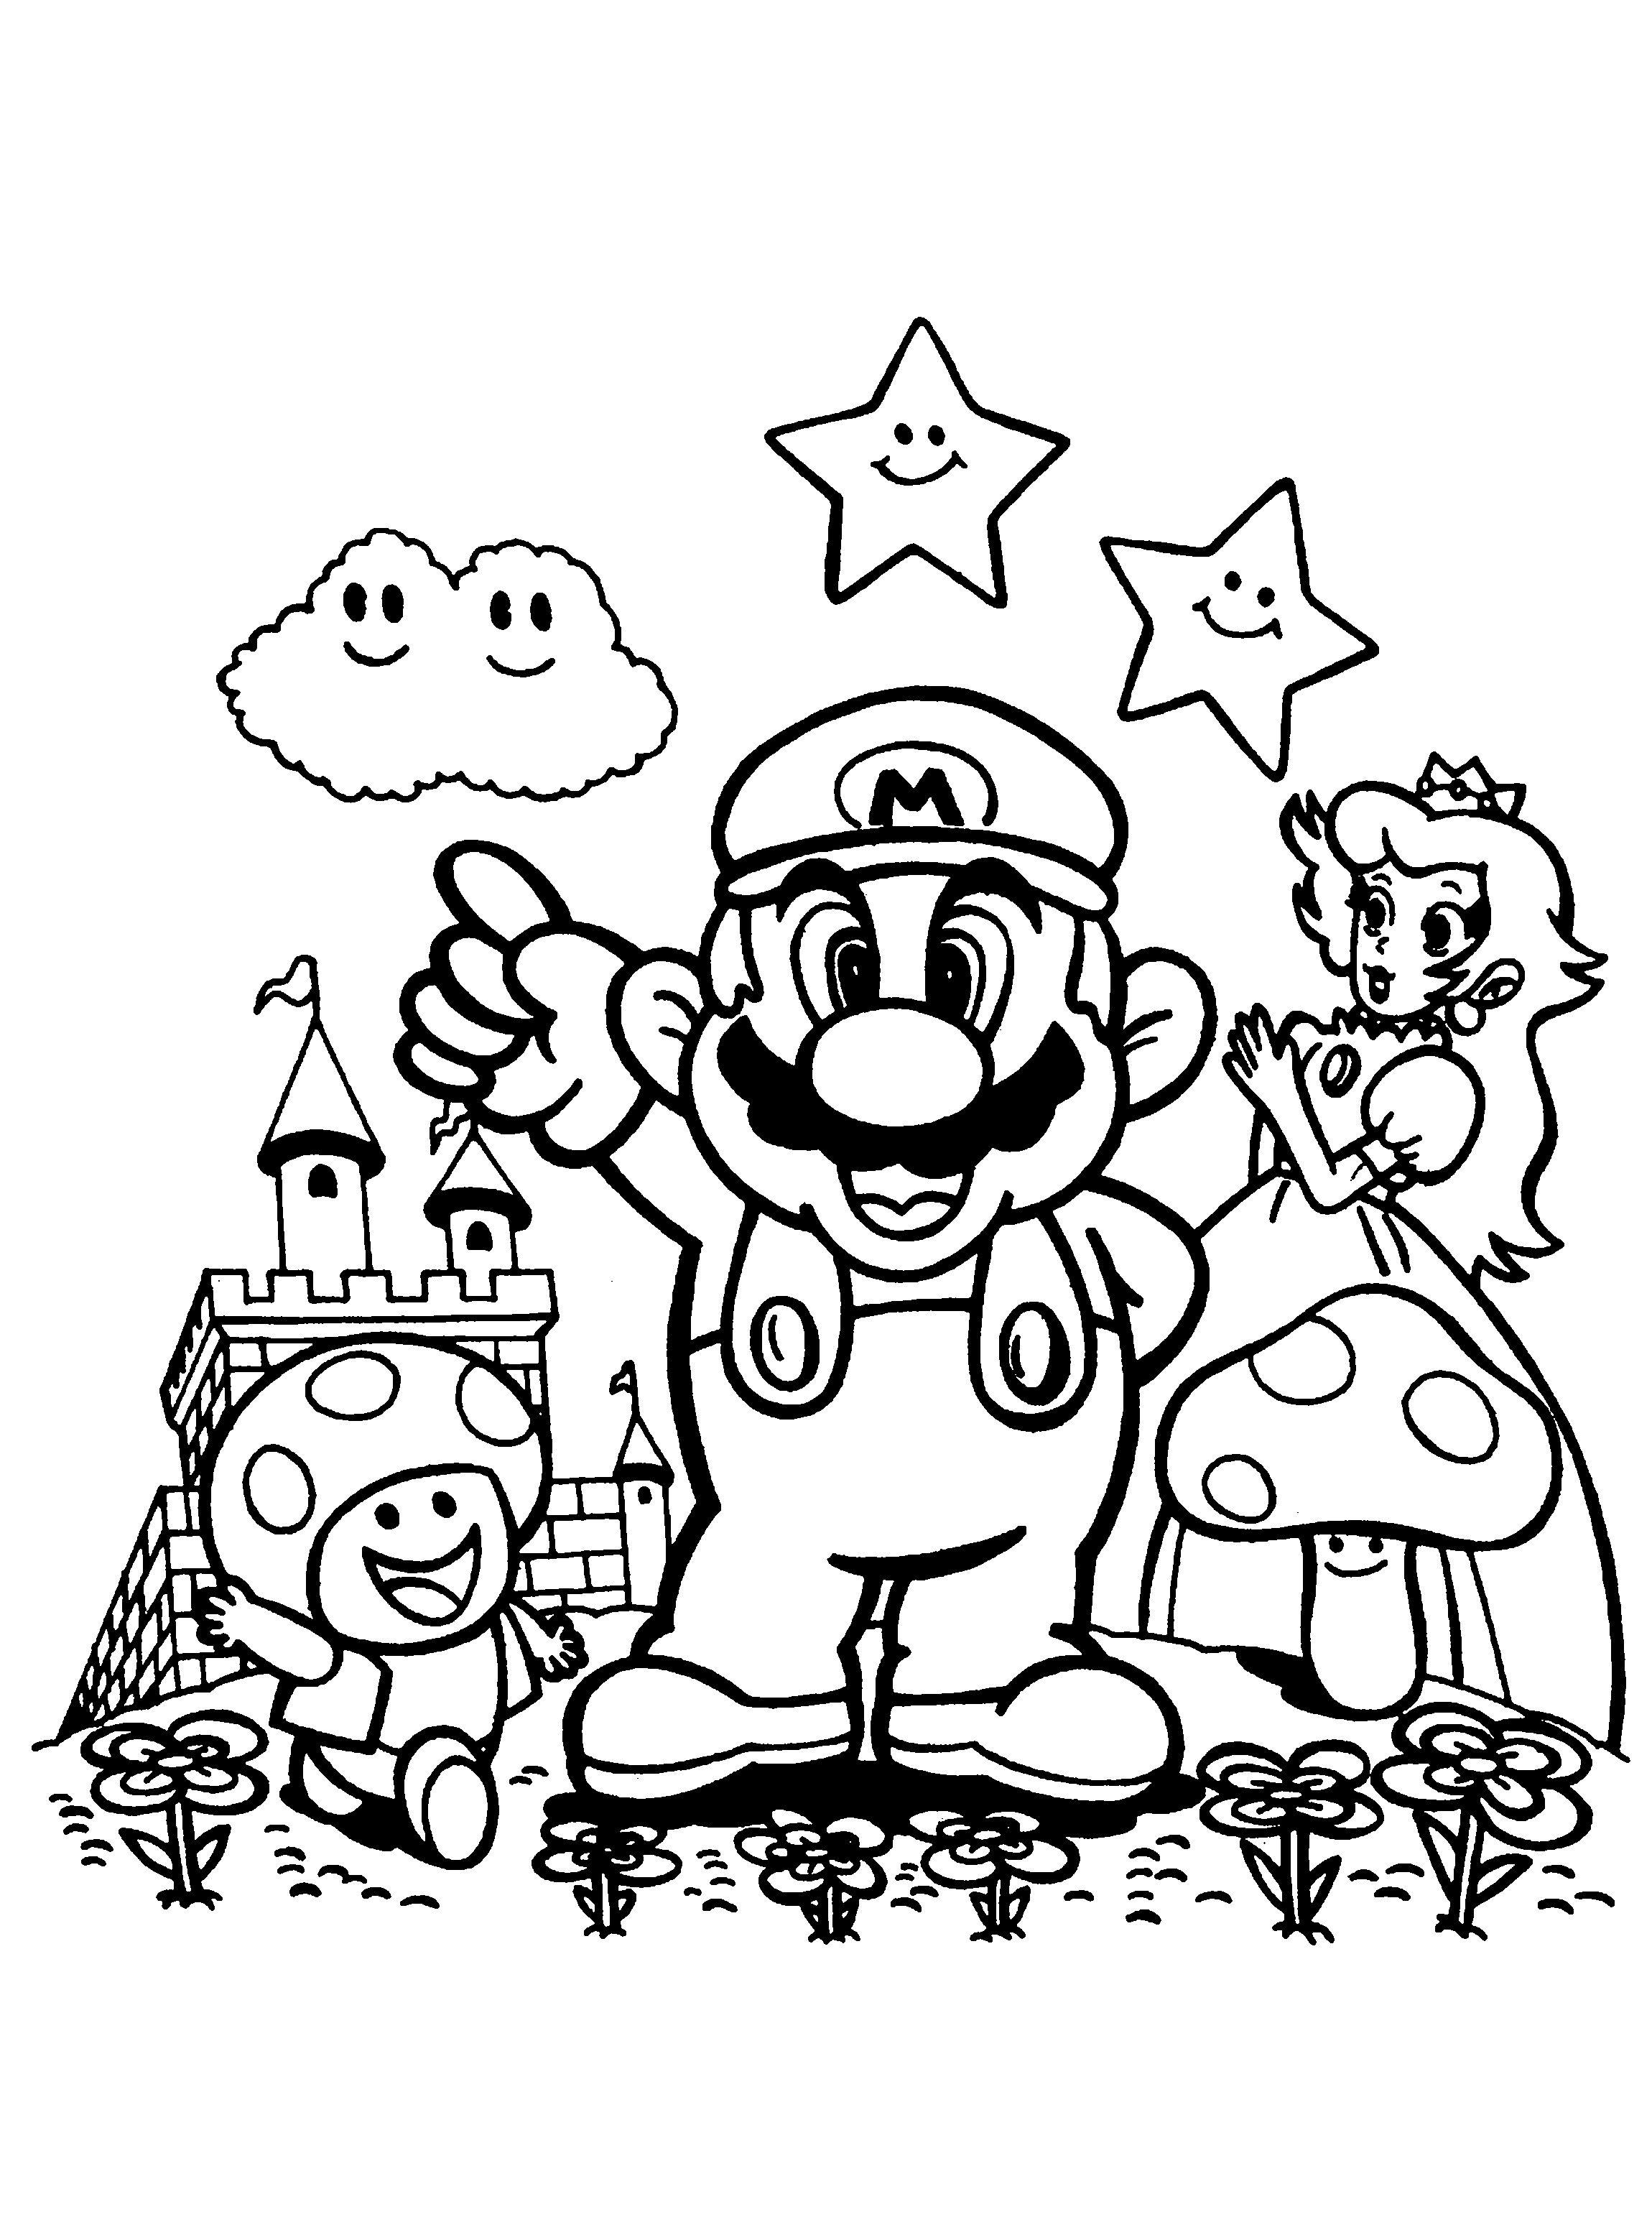 Coloriage Super Mario Bros Et Dessin Vault Boy Character